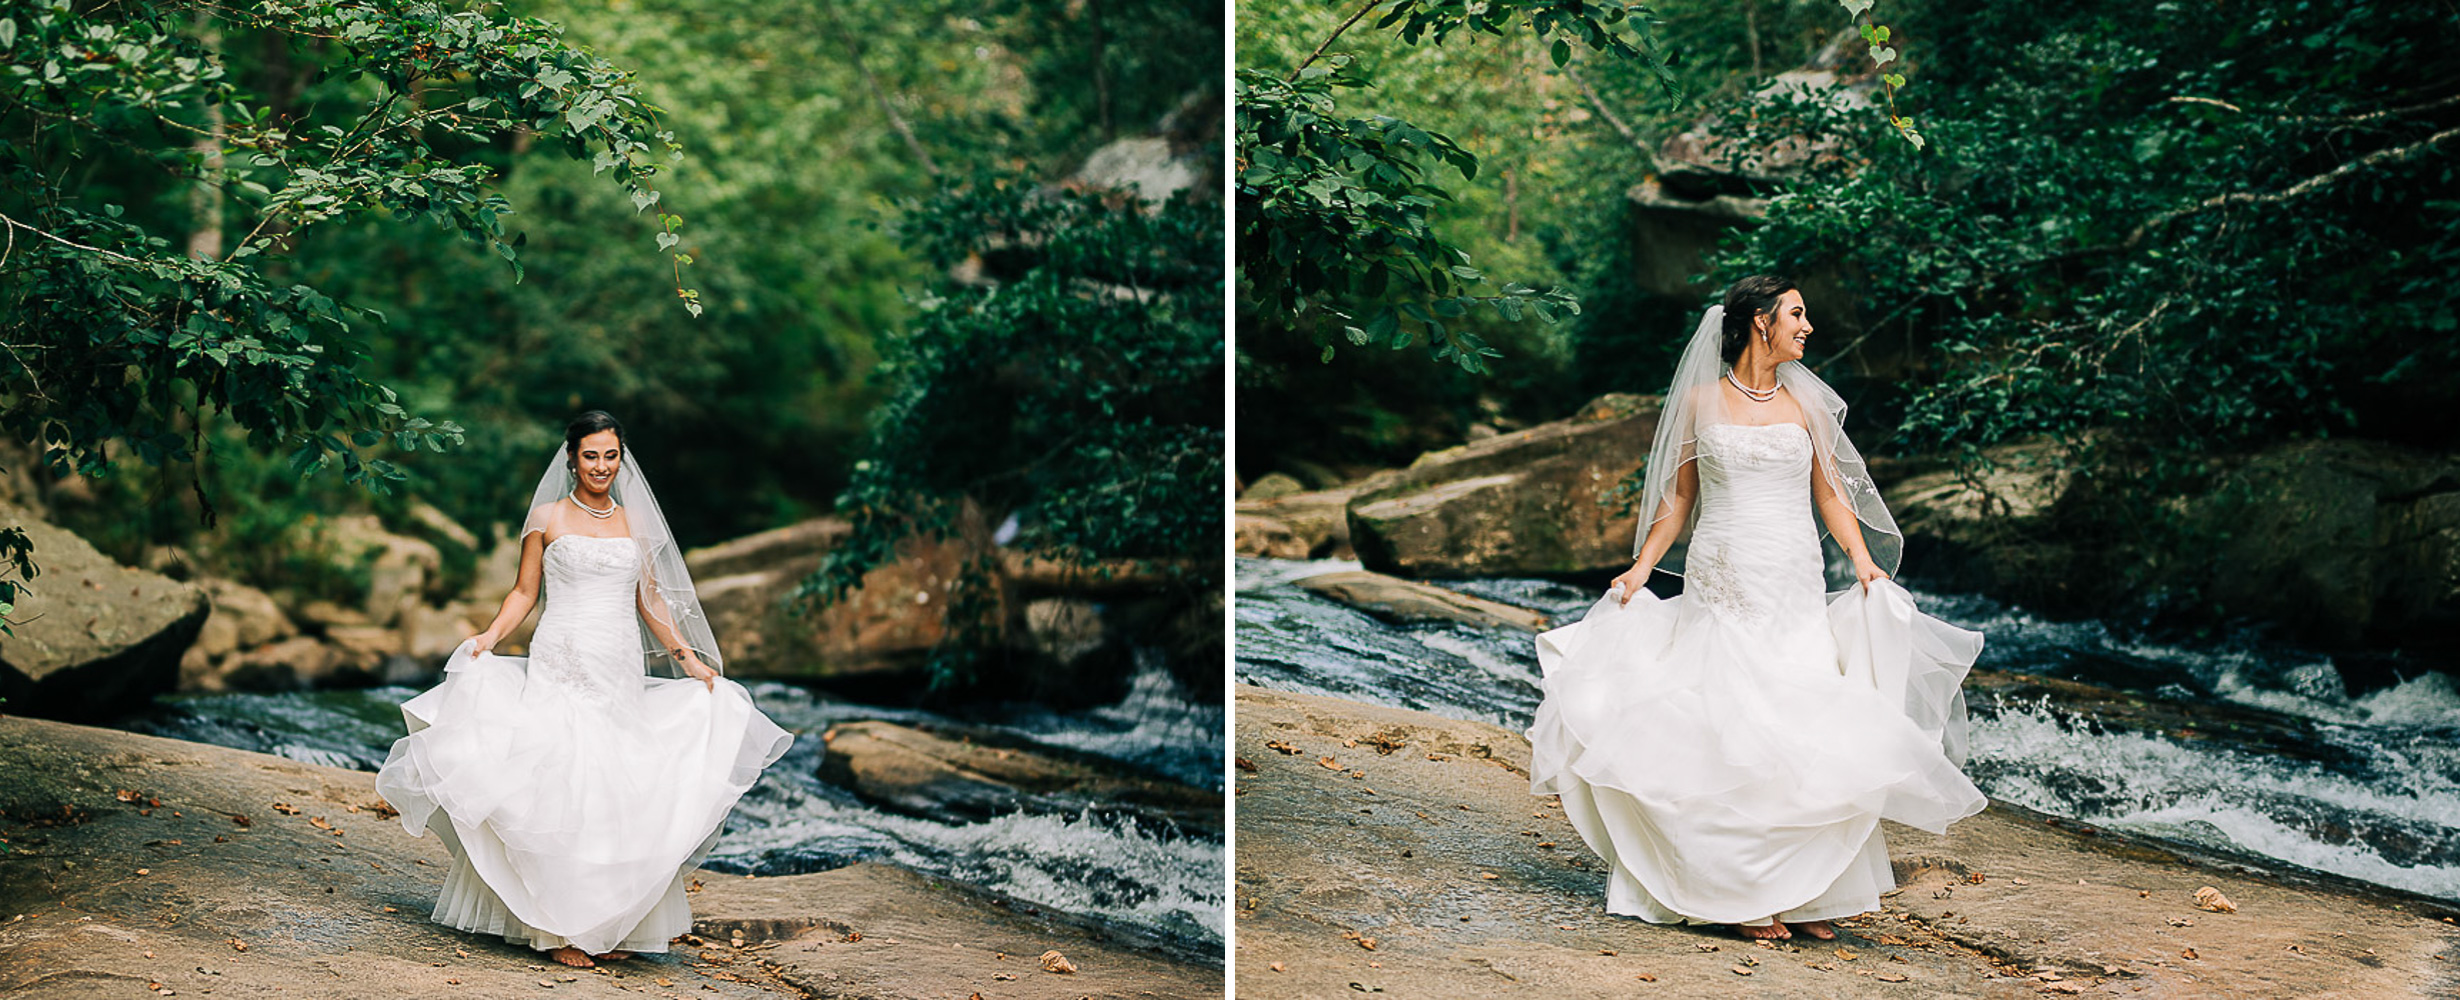 River Bridal Portraits, South Carolina Wedding Photographer, 05.jpg